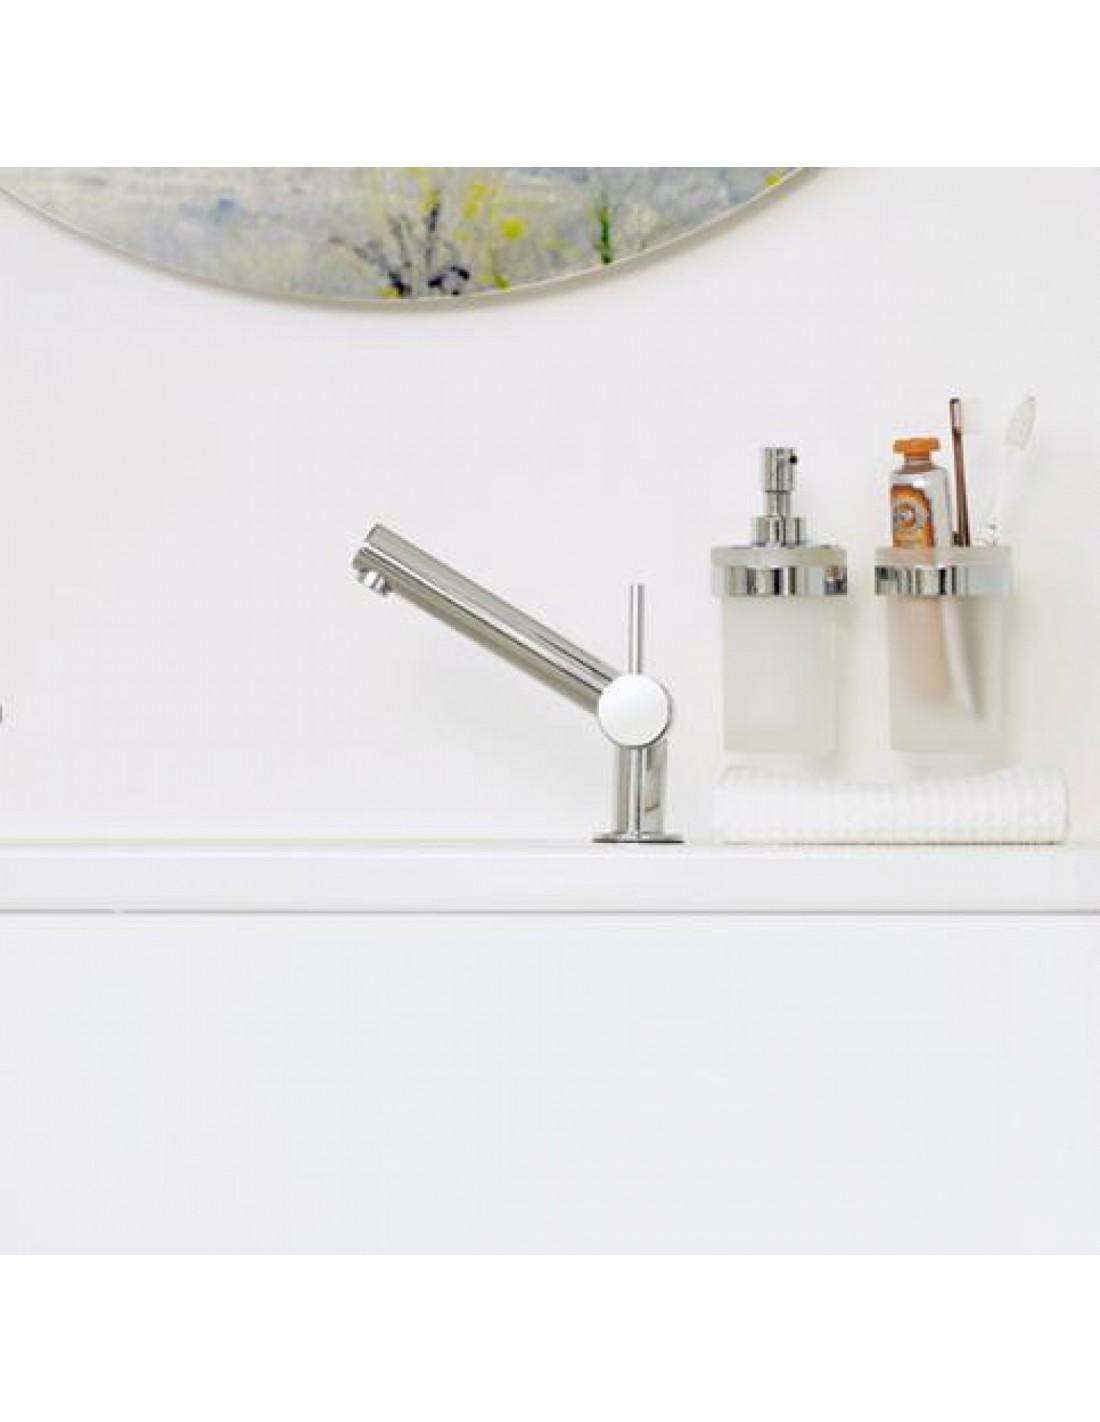 Distributeur de savon liquide mural verre coller duo round for Distributeur de savon mural design